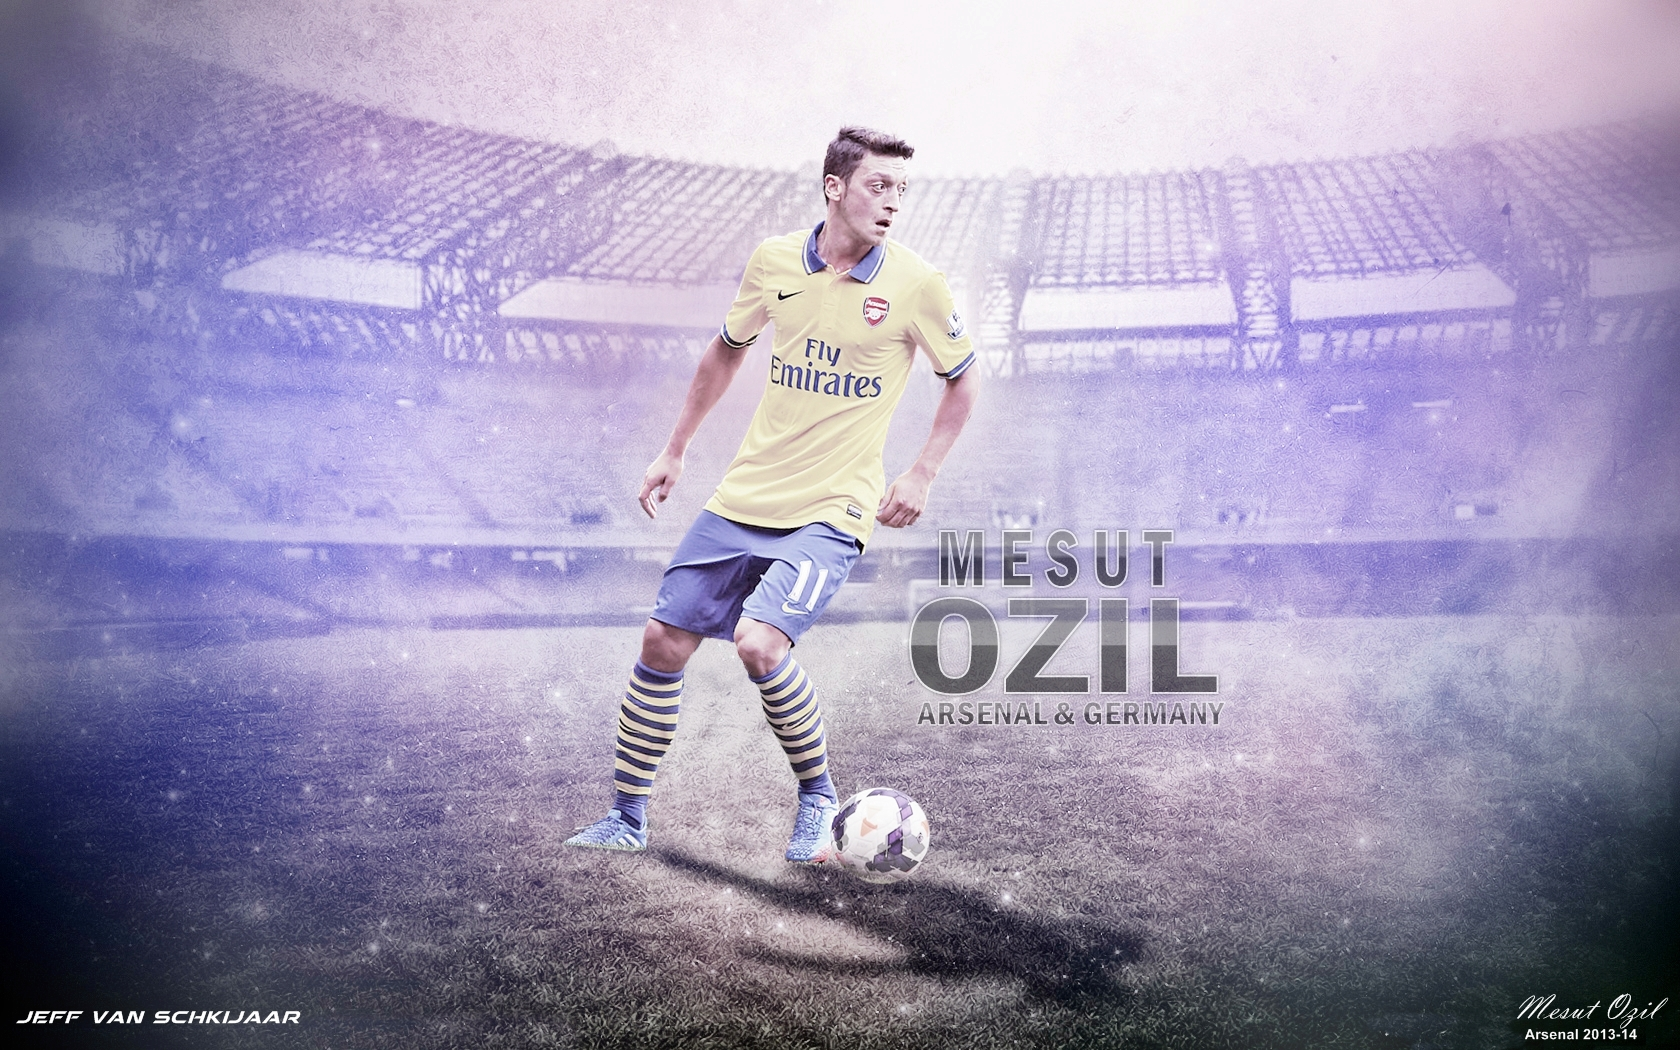 Mesut Ozil Arsenal Hd Wallpaper Best Wallpapers 1680x1050